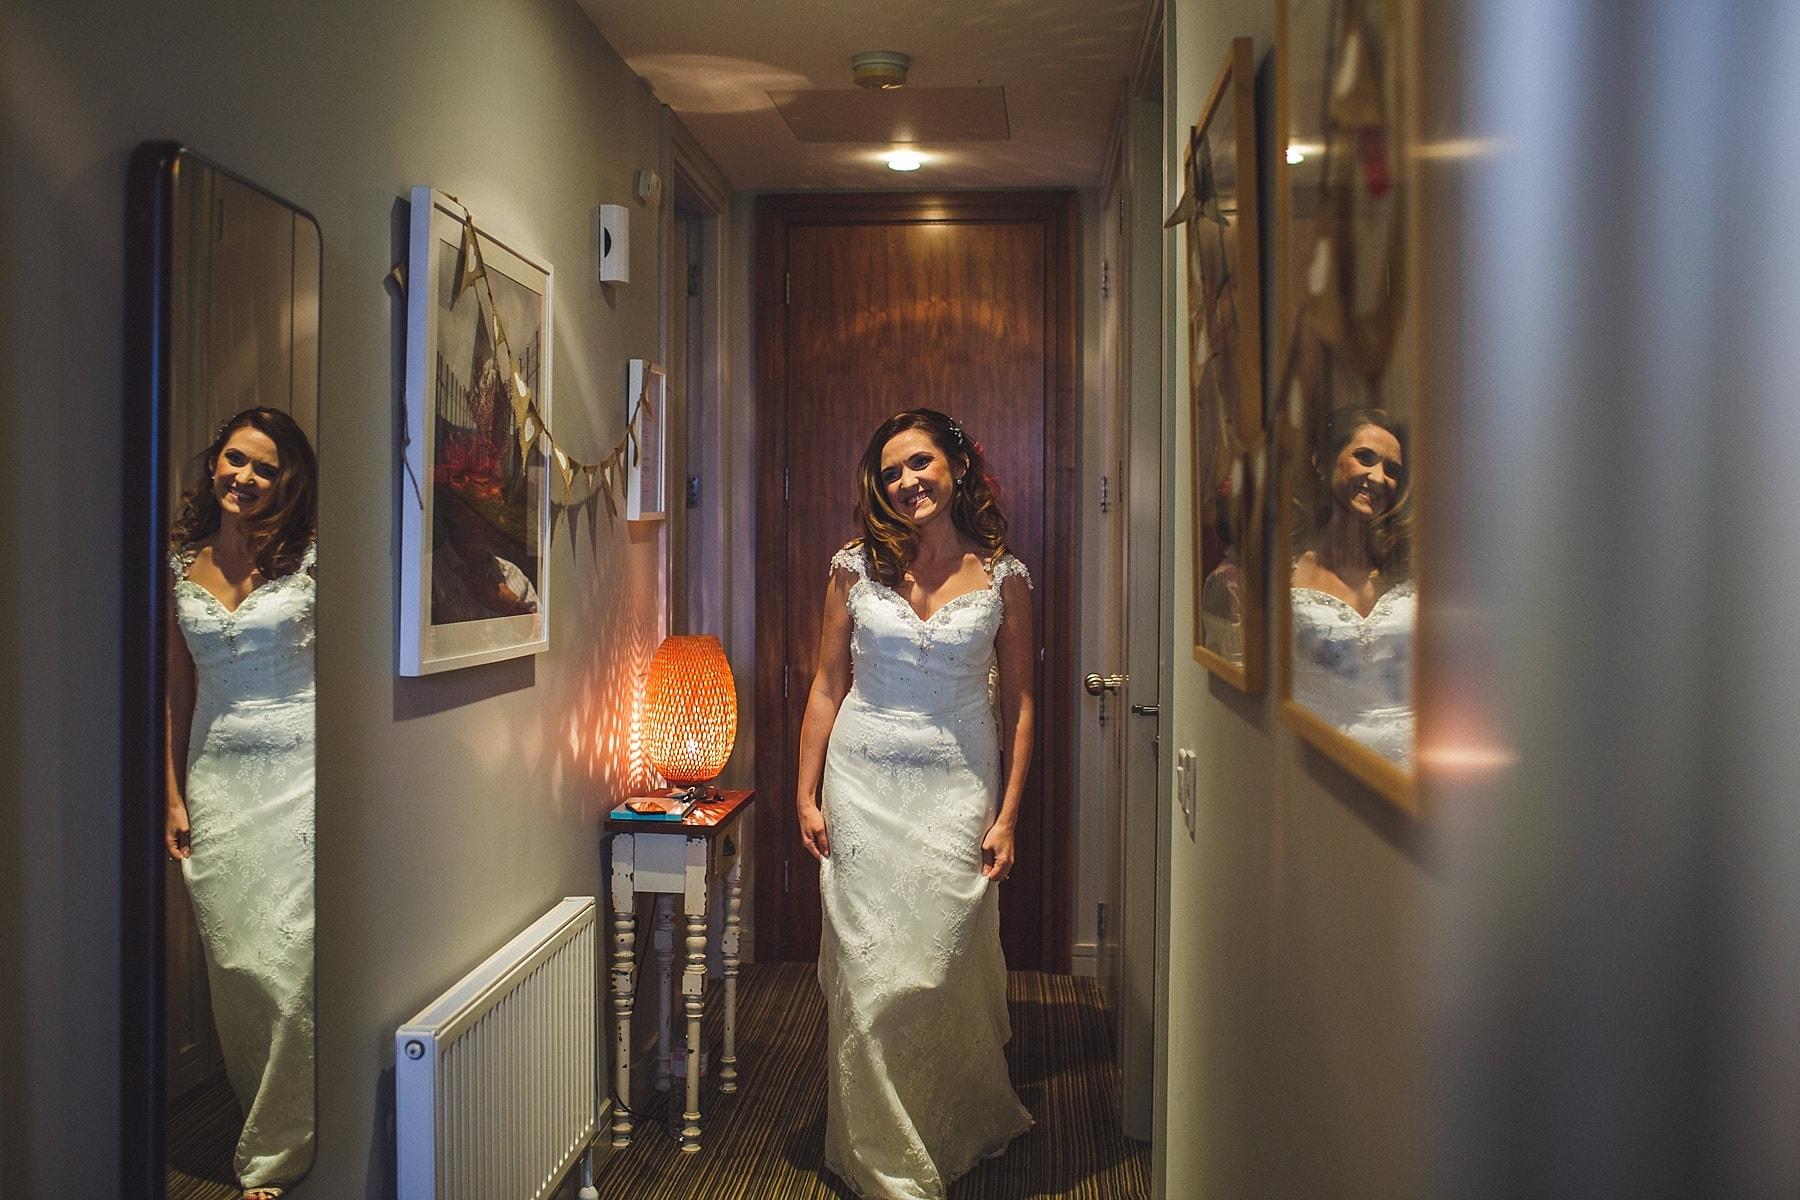 belfast city,northern ireland wedding photographer,ss nomadic wedding,rain,happy couple,